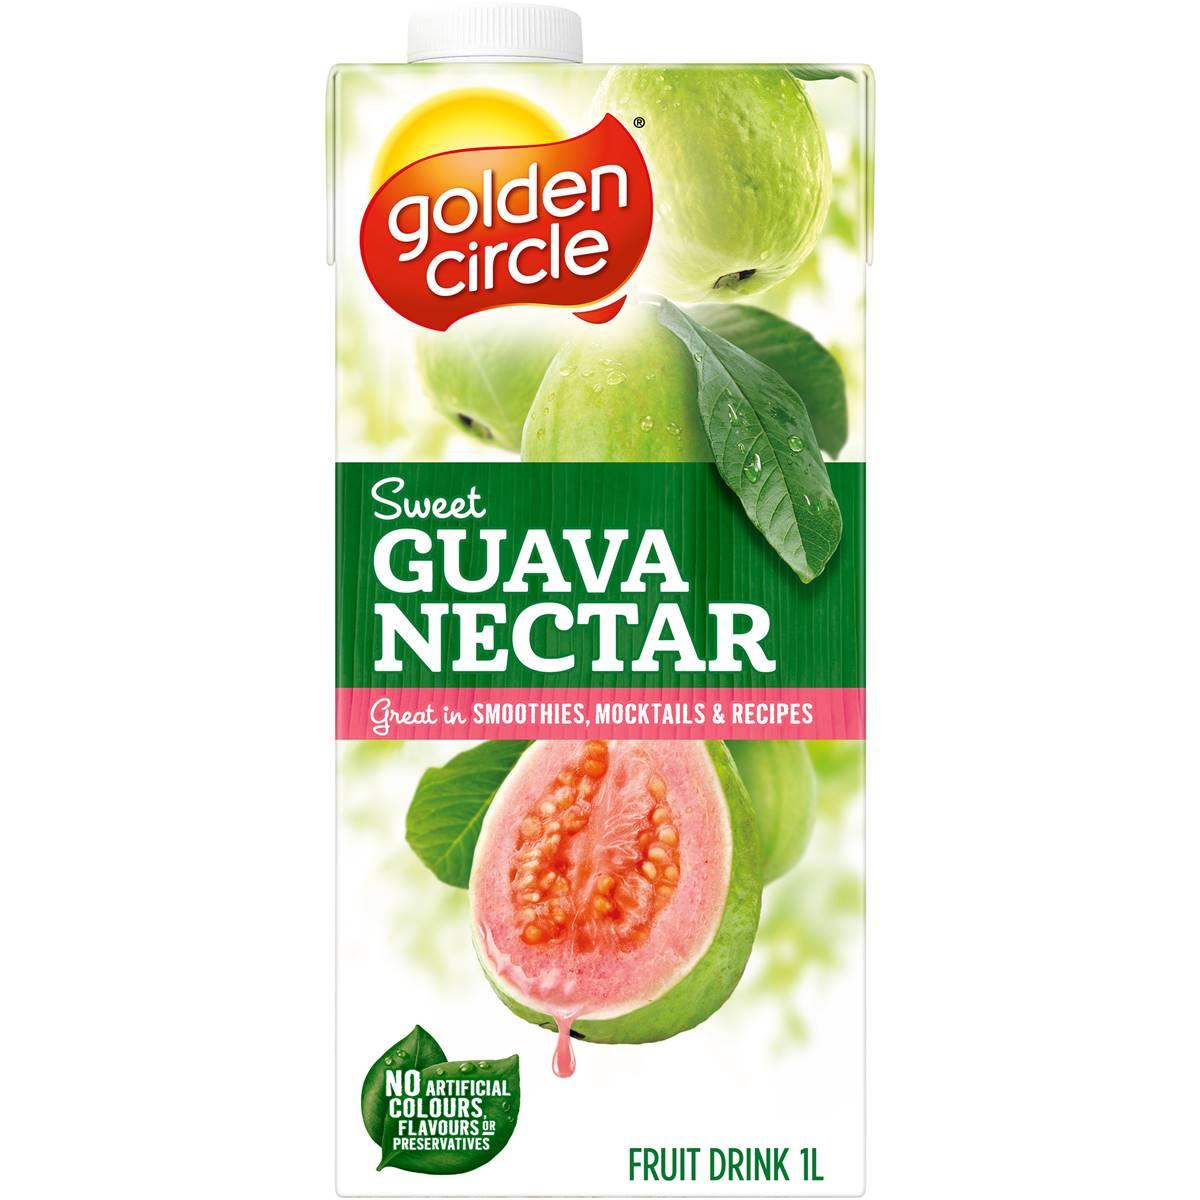 Golden Circle Guava Nectar